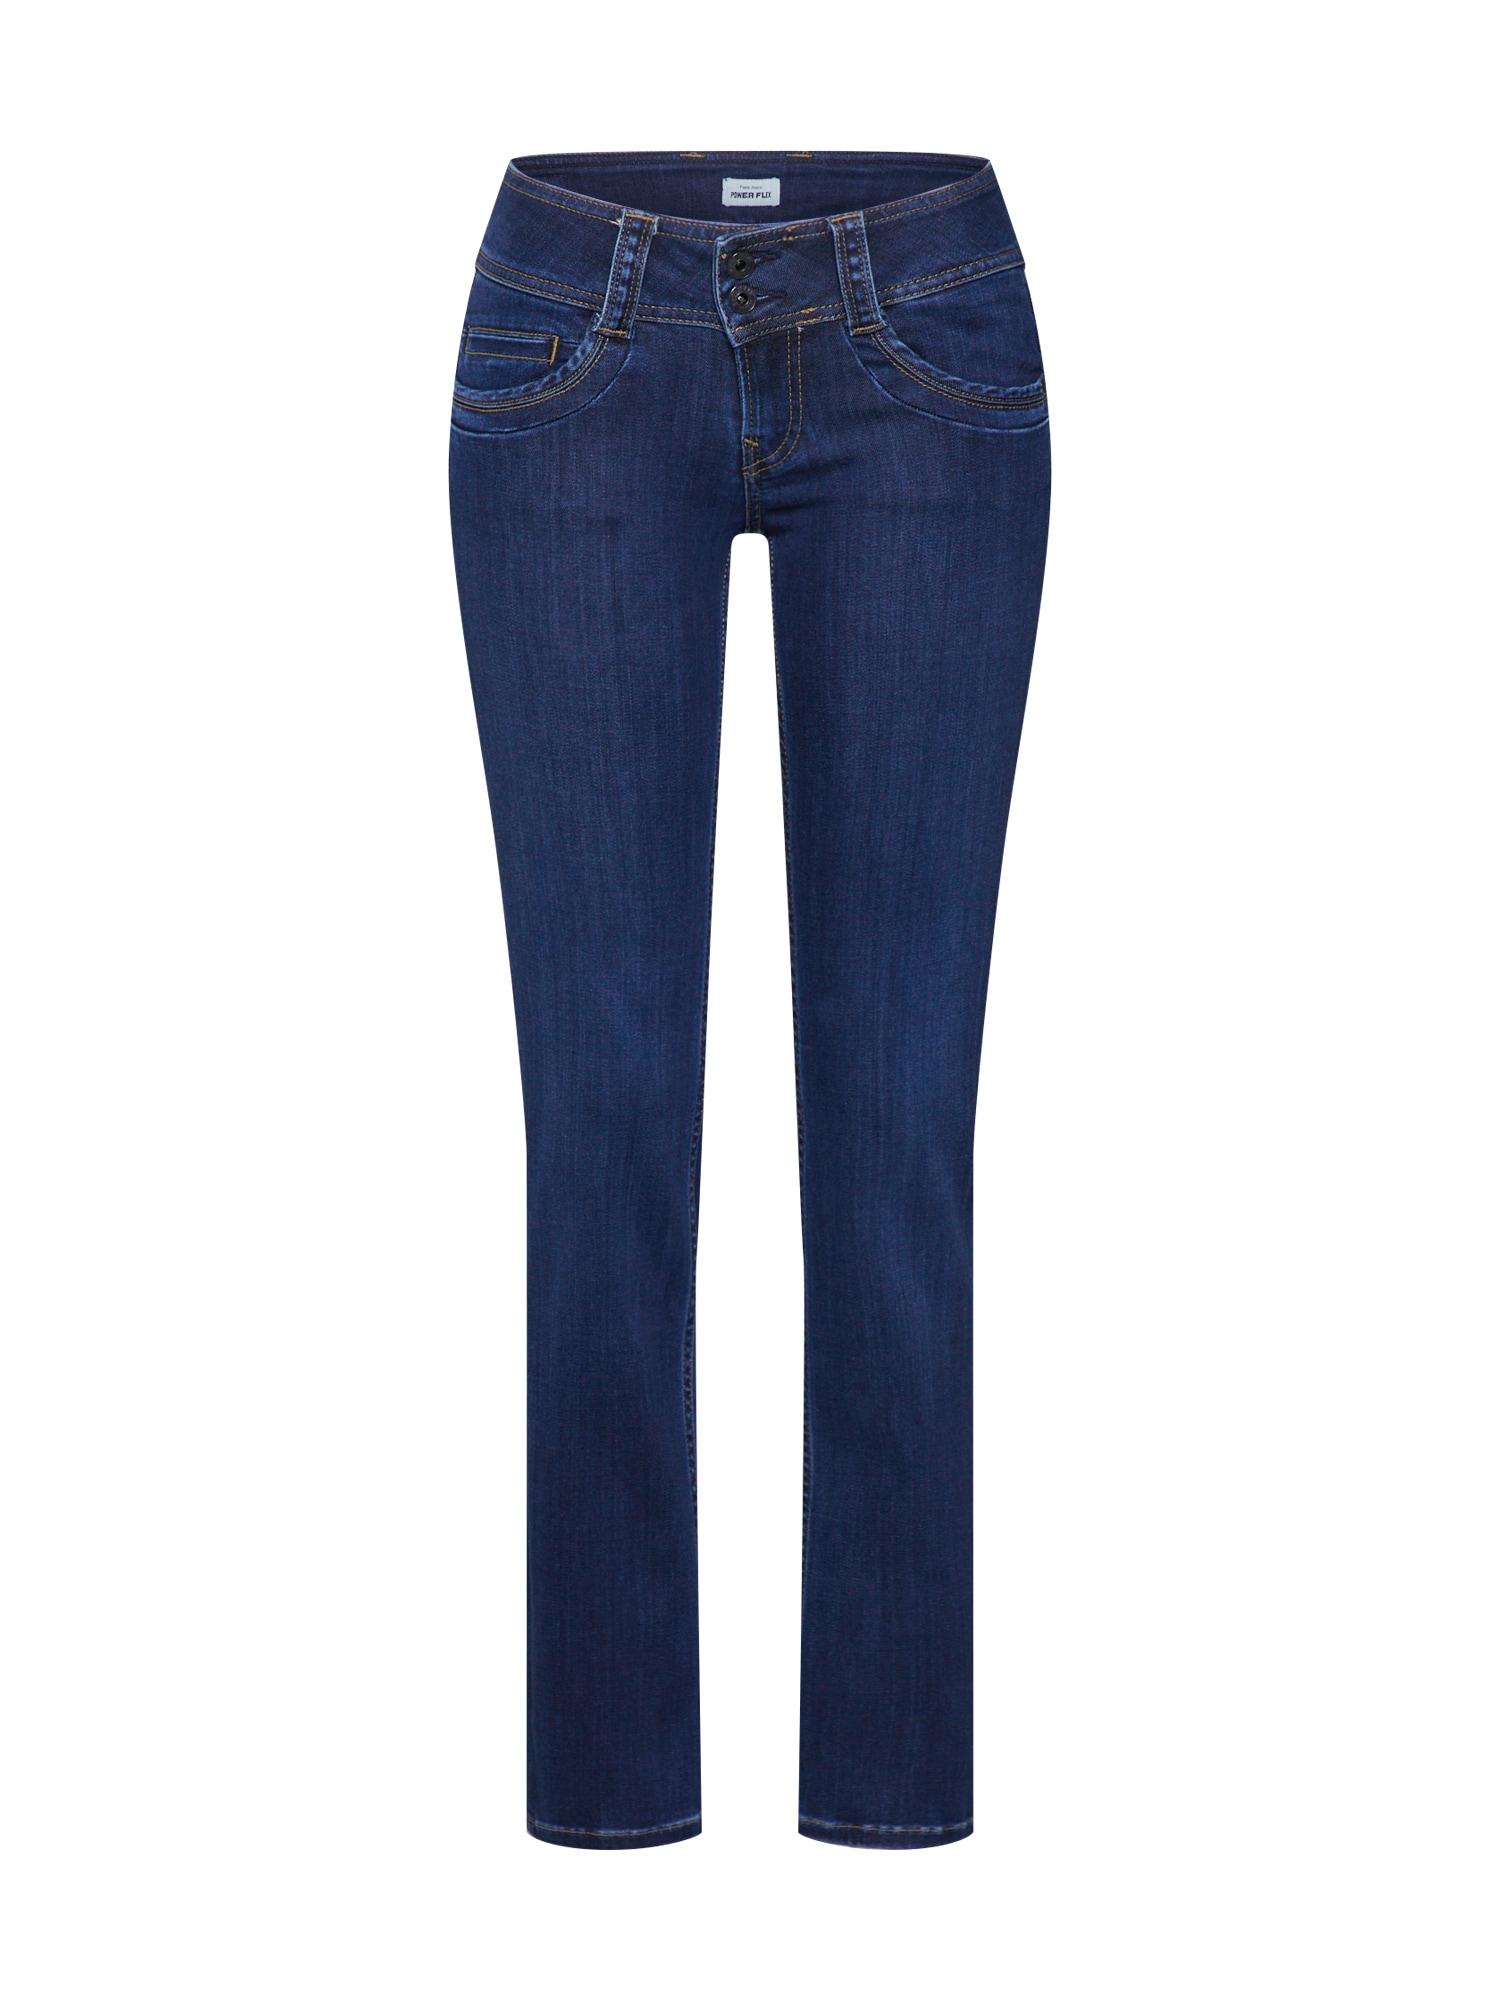 Pepe Jeans Džínsy 'GEN'  modrá denim